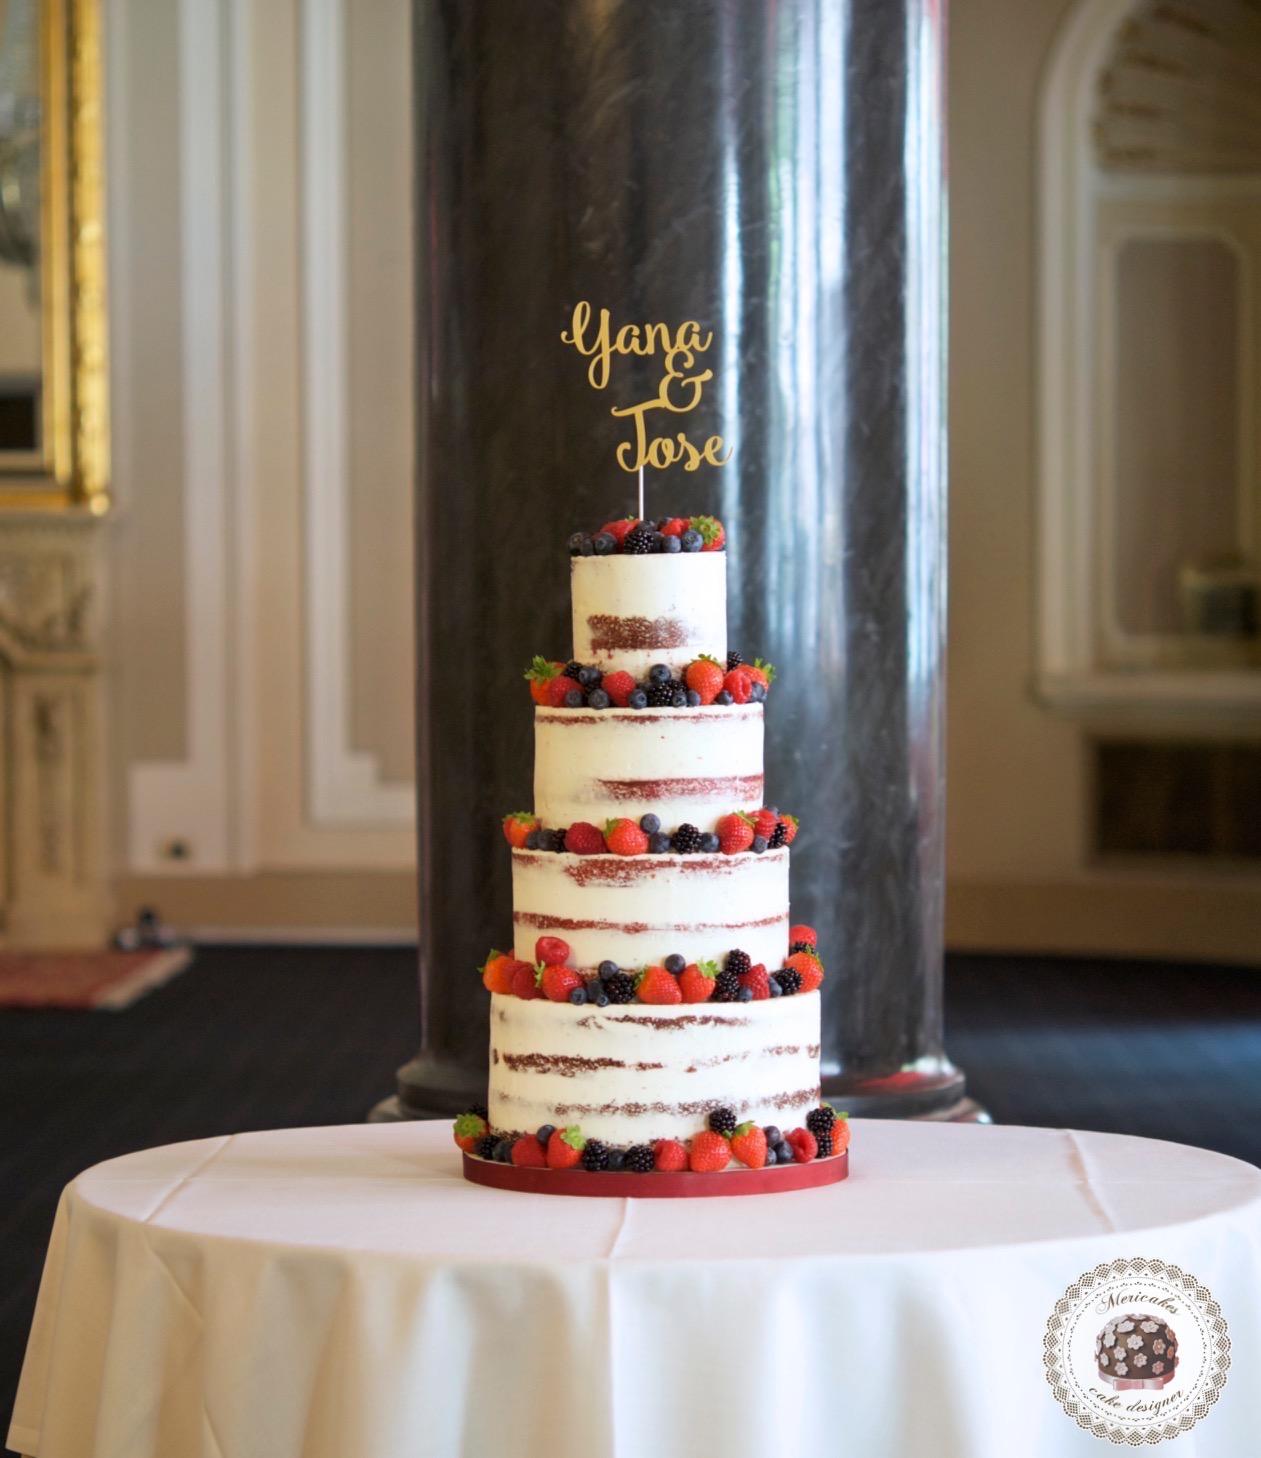 semi naked cake, mericakes, wedding cake, Hote Palace, Spain wedding, red velvet, berries, tarta de boda, fruit cake, pasteleria creativa, tartas barcelona, cake topper, wedding blogguer, bodas reales, barcelona